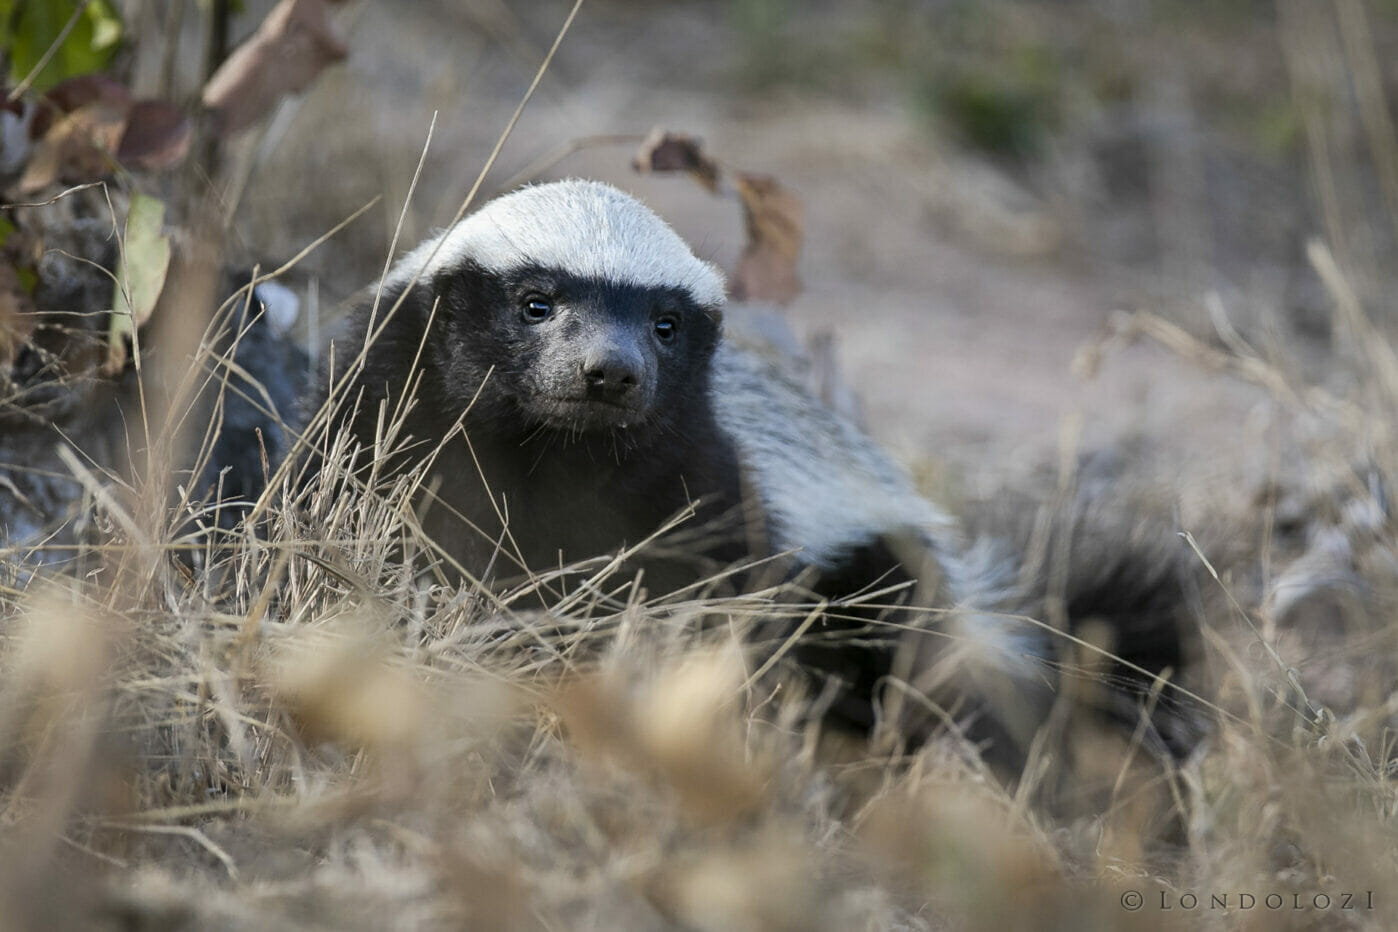 Sdz Honey Badger daytime